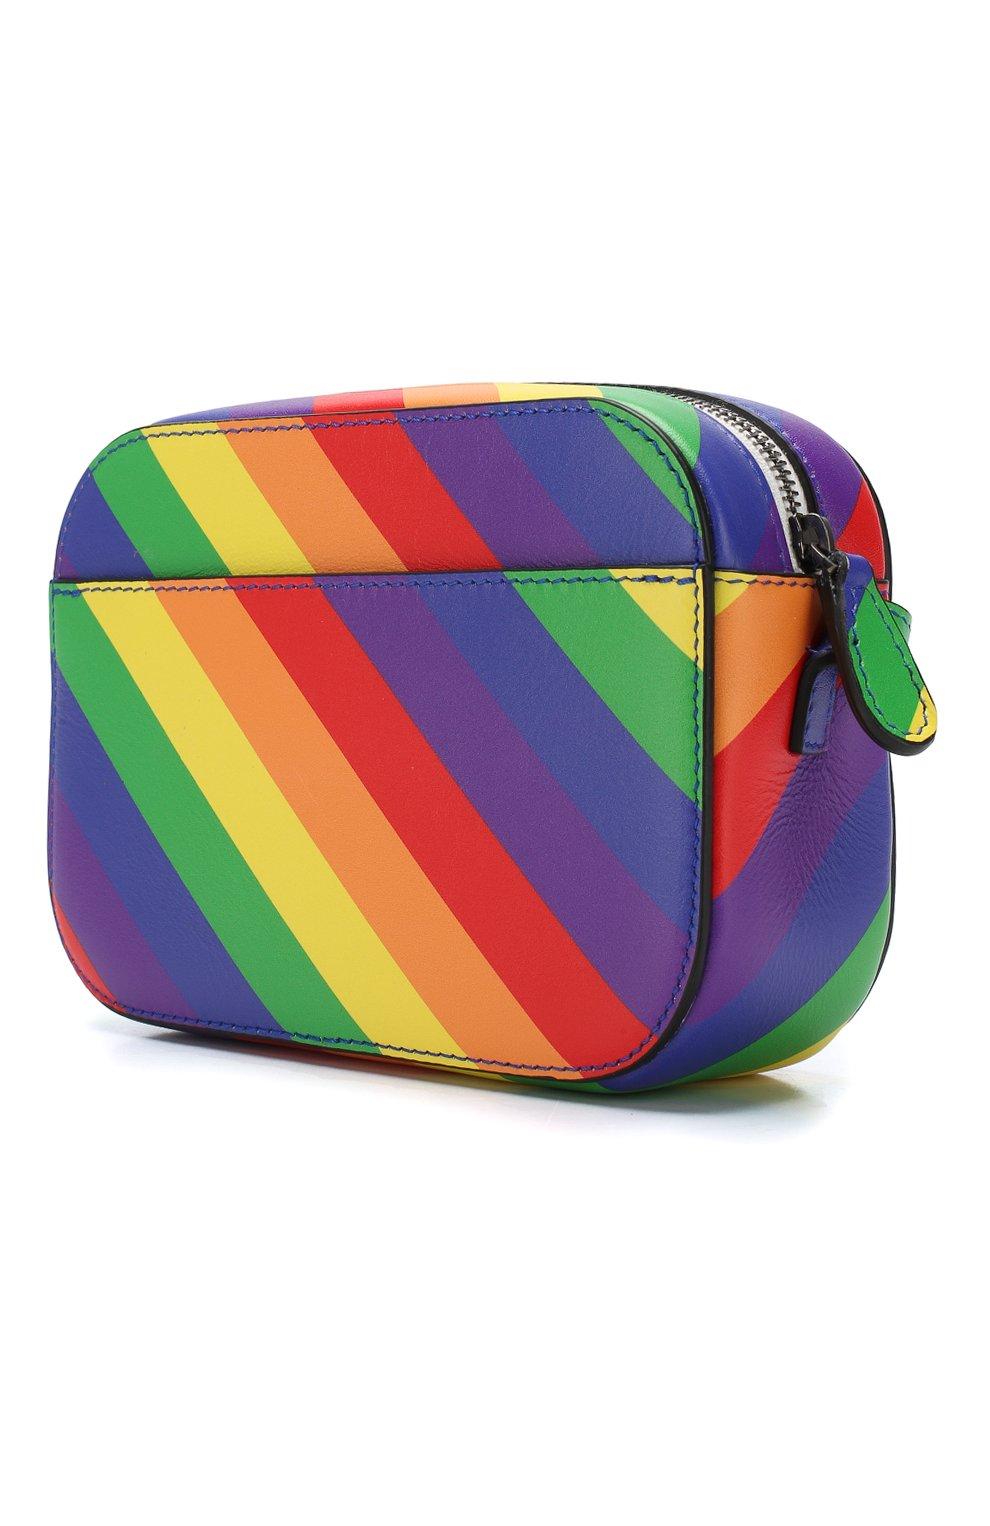 Сумка Ville Camera XS Balenciaga разноцветная цвета | Фото №3